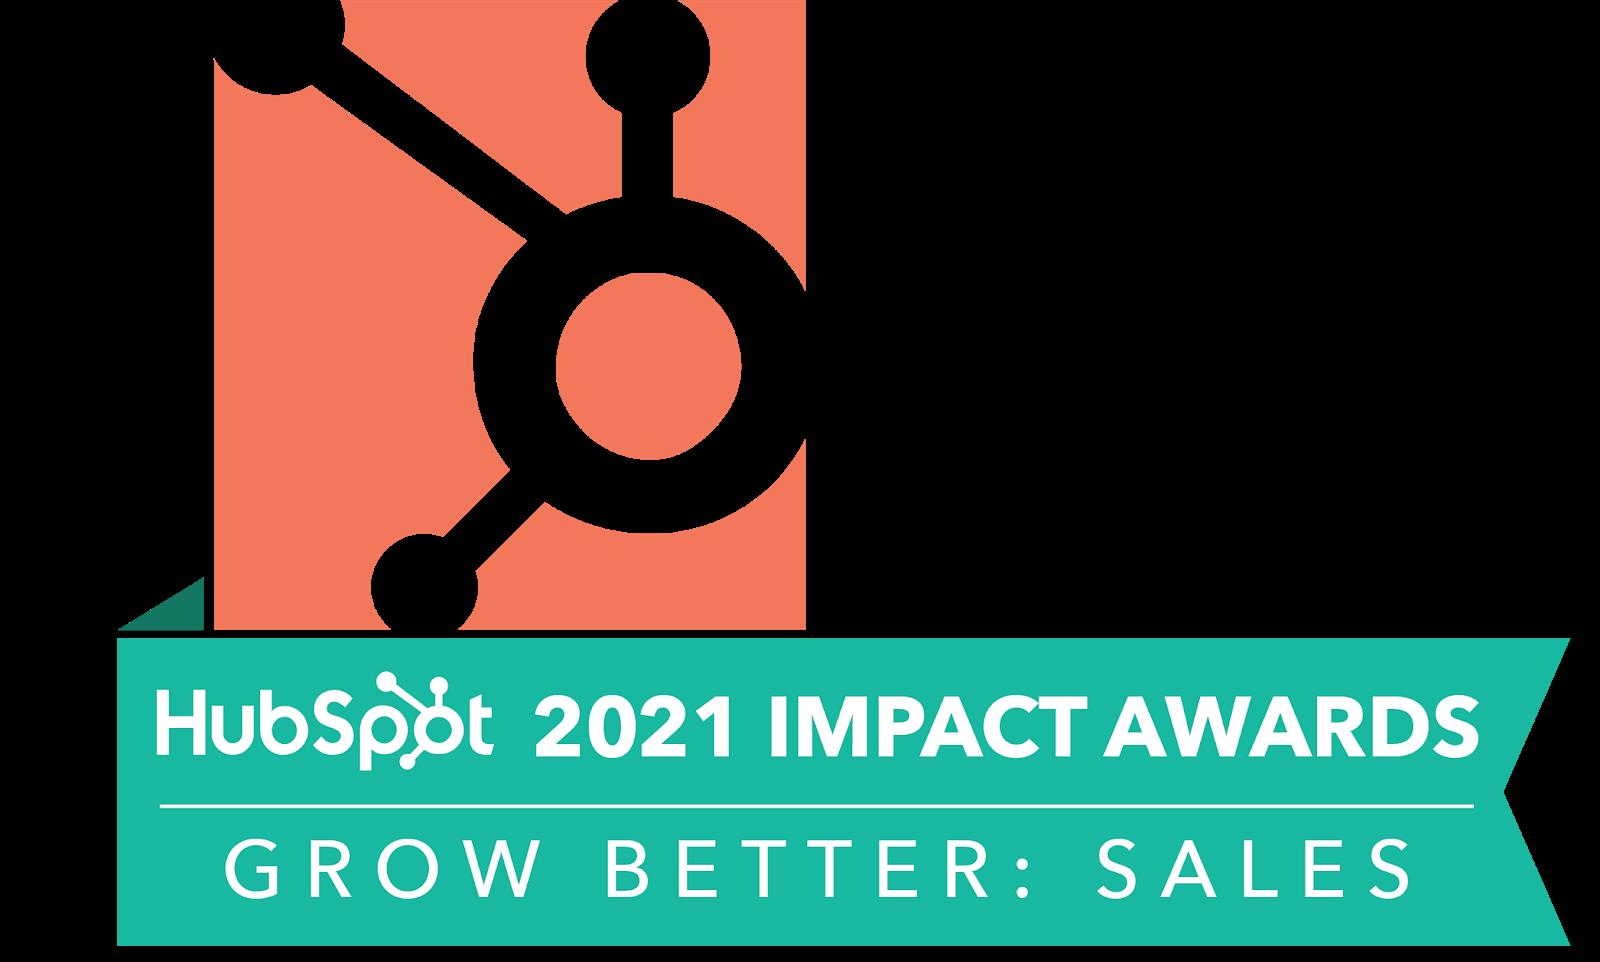 HubSpot-Impact-Awards-2021-GBSales-badge